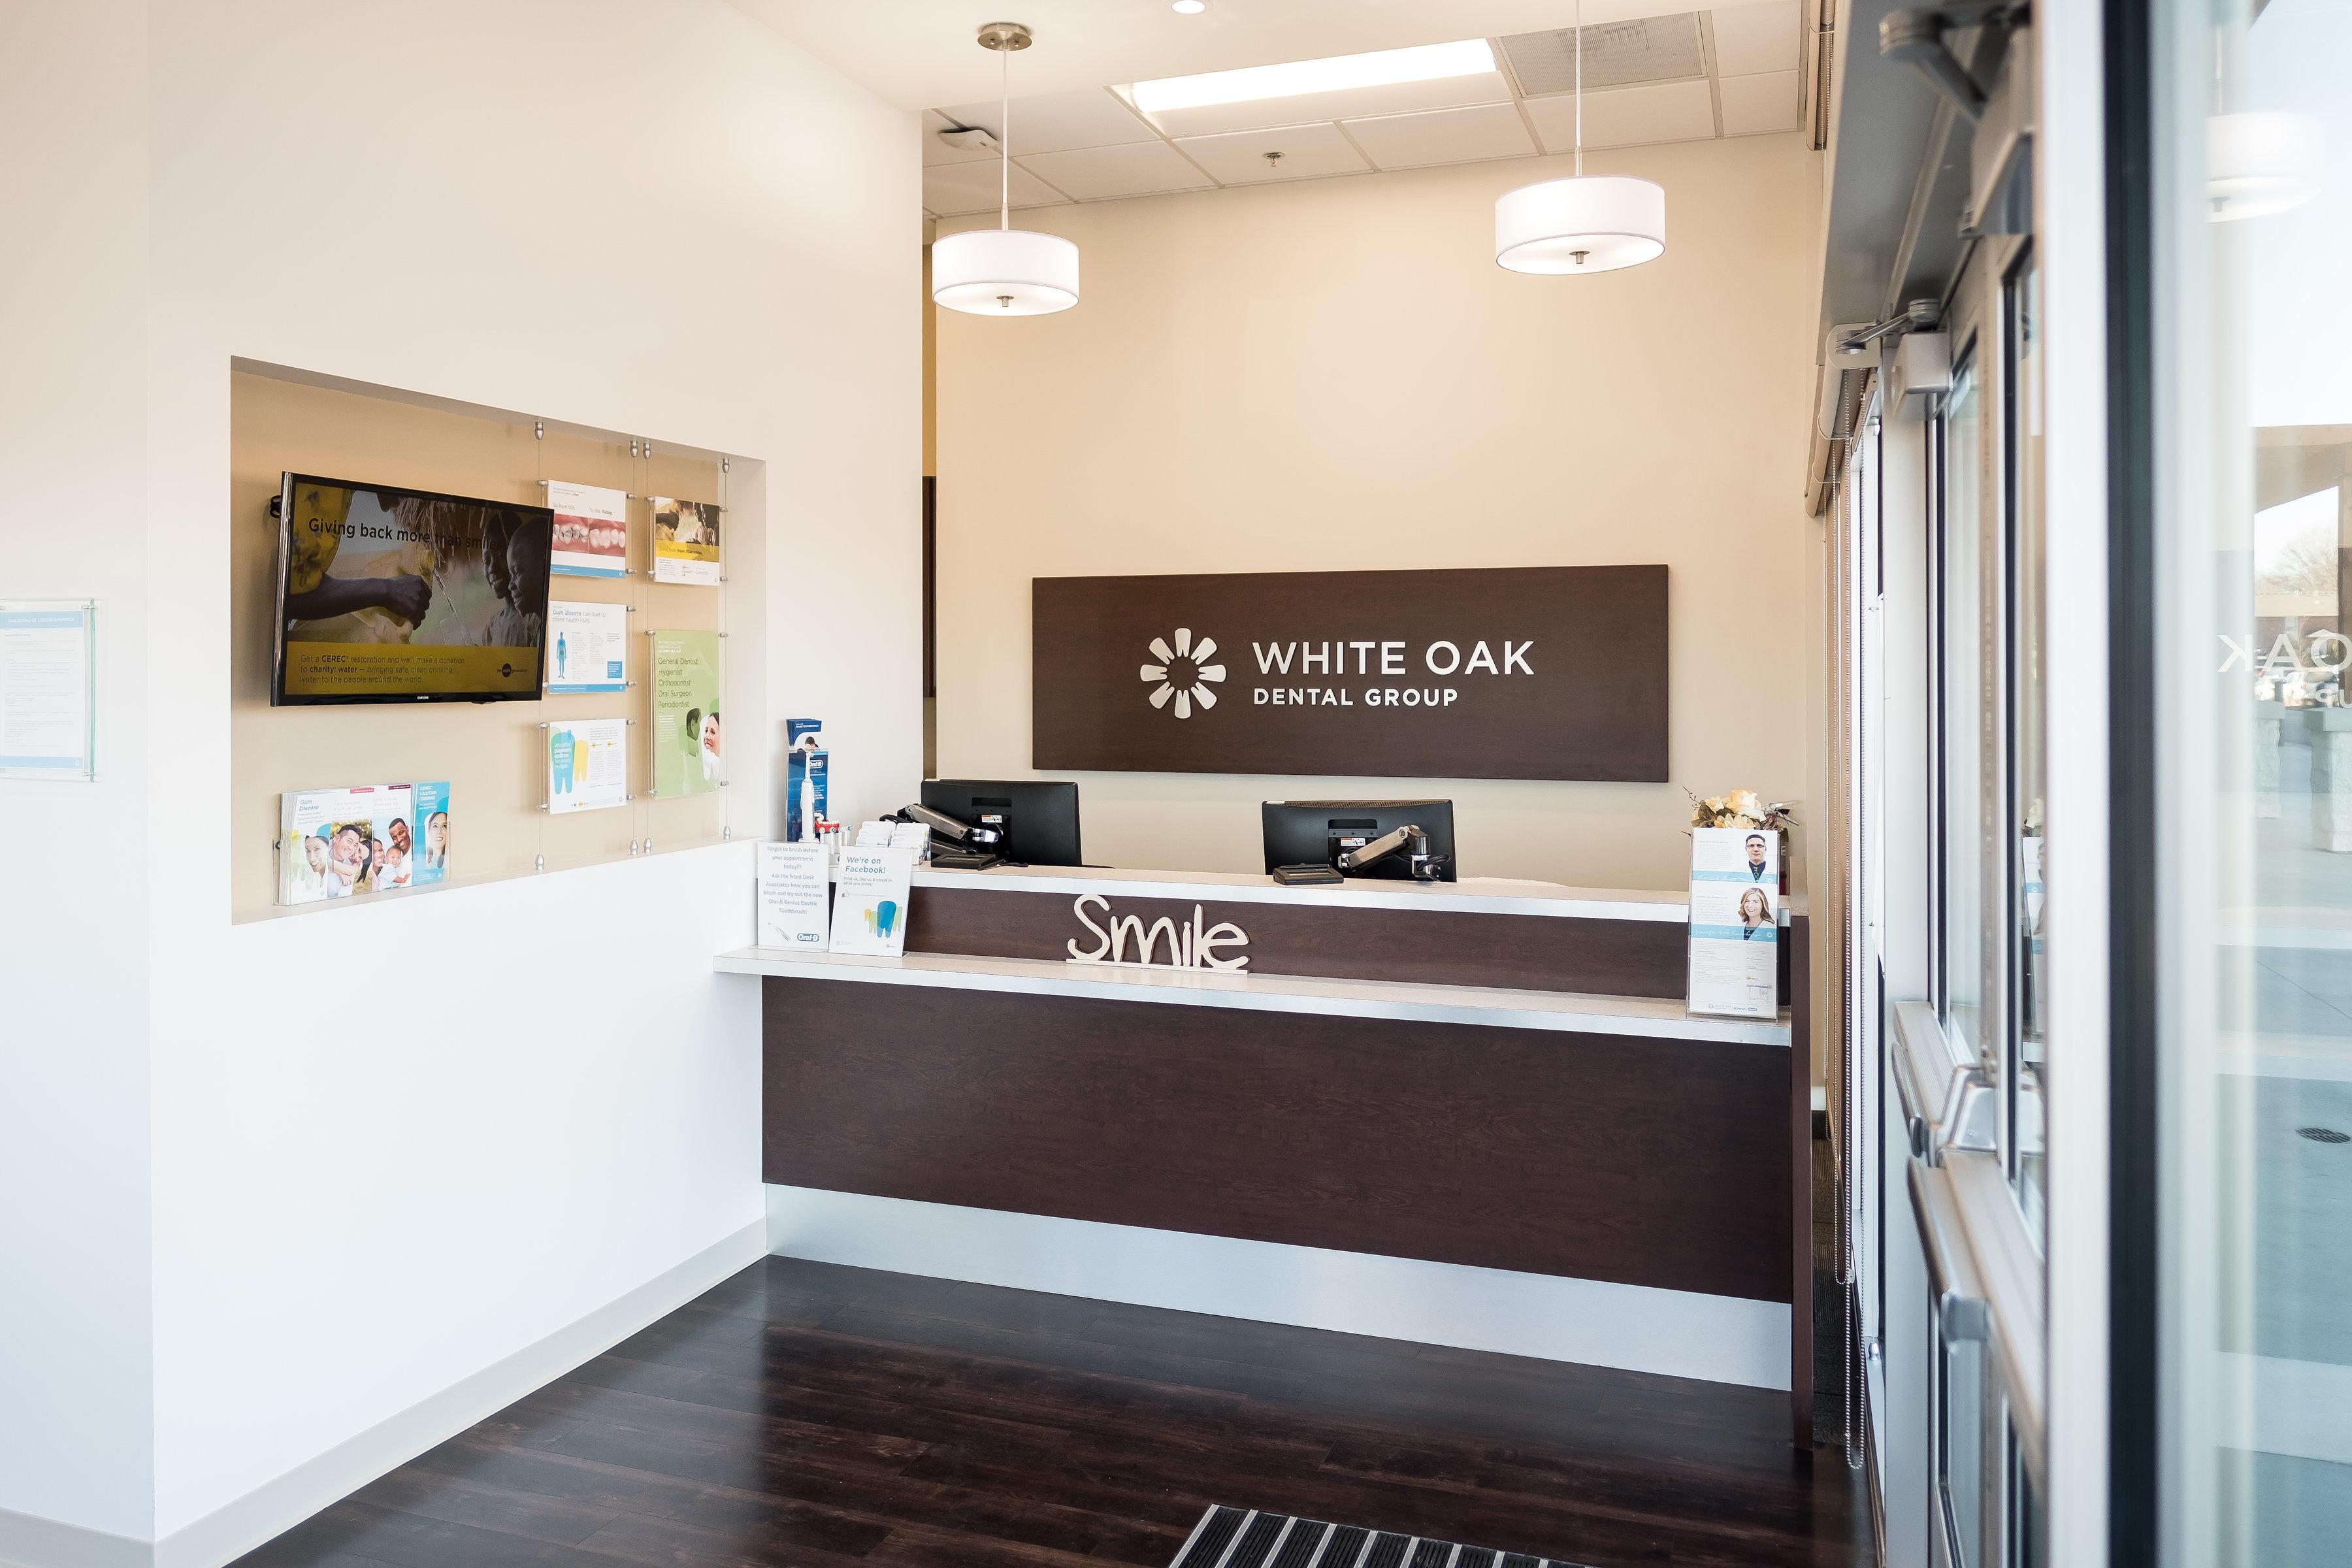 White Oak Dental Group image 10